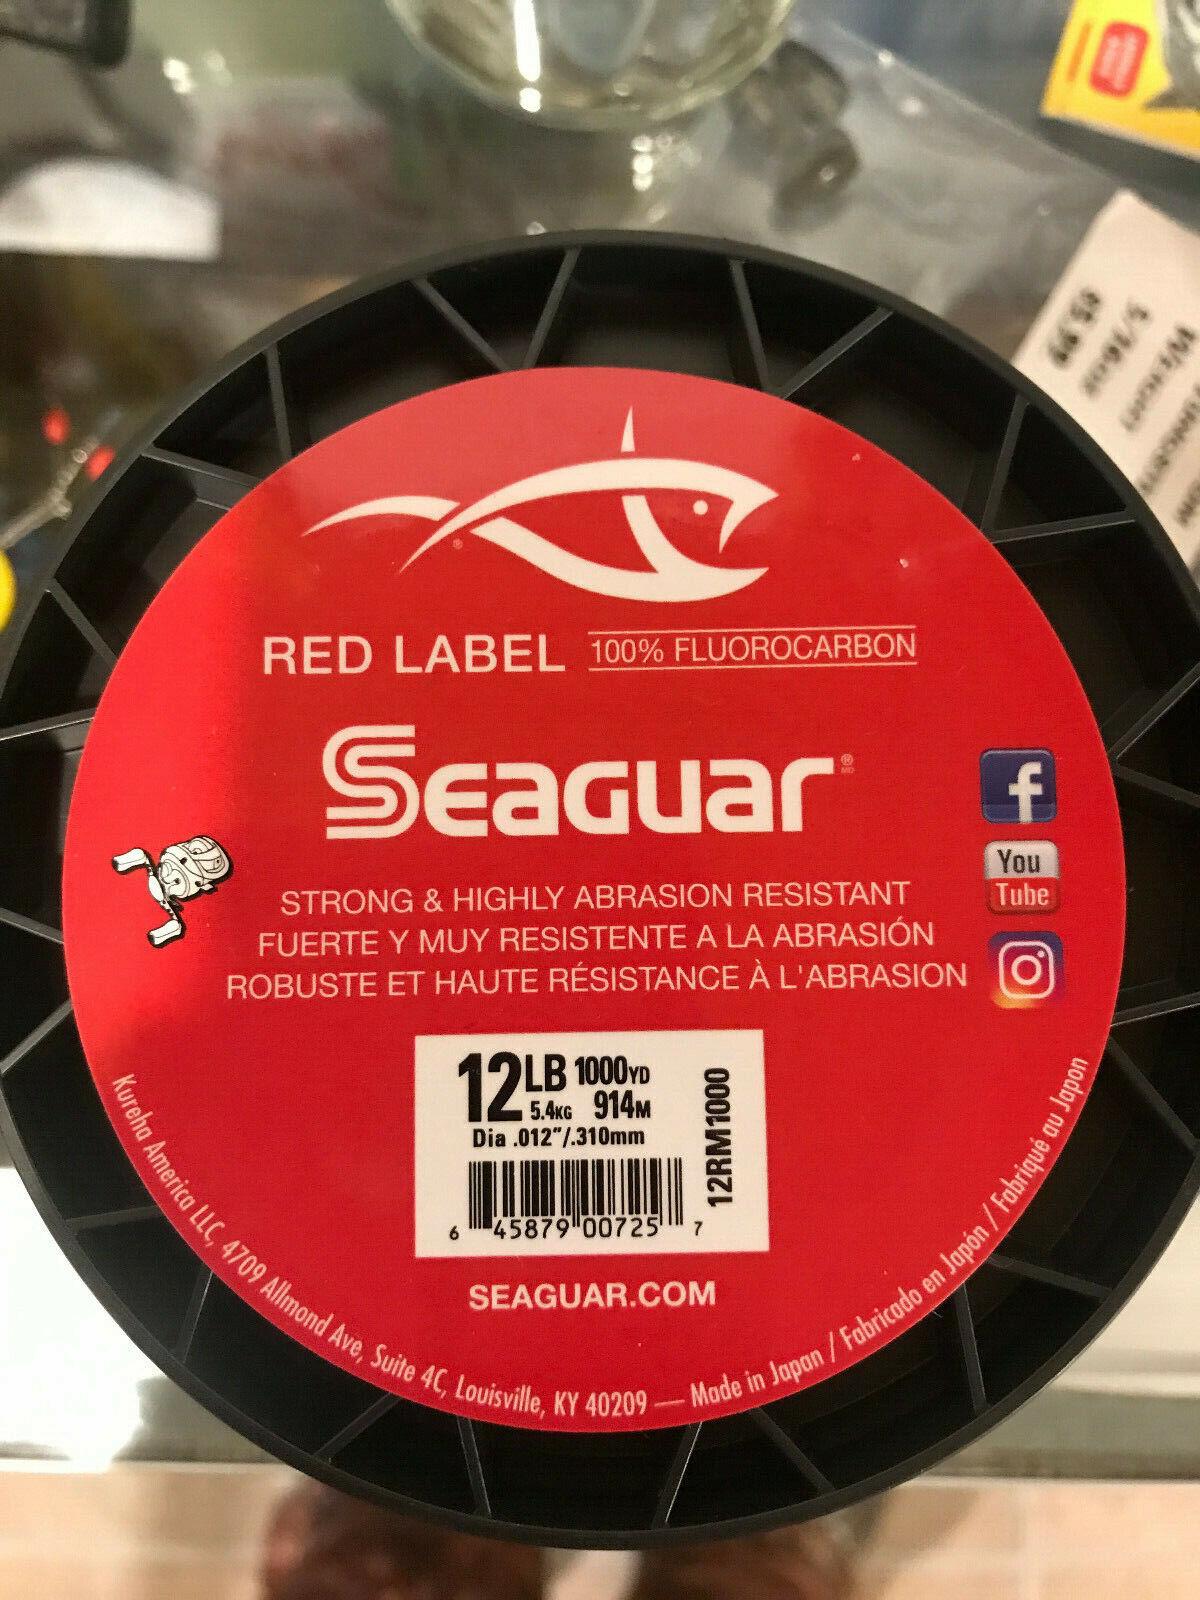 Seaguar Red Label 100  Fluorocarbon  1000yd 20lb 20RM1000